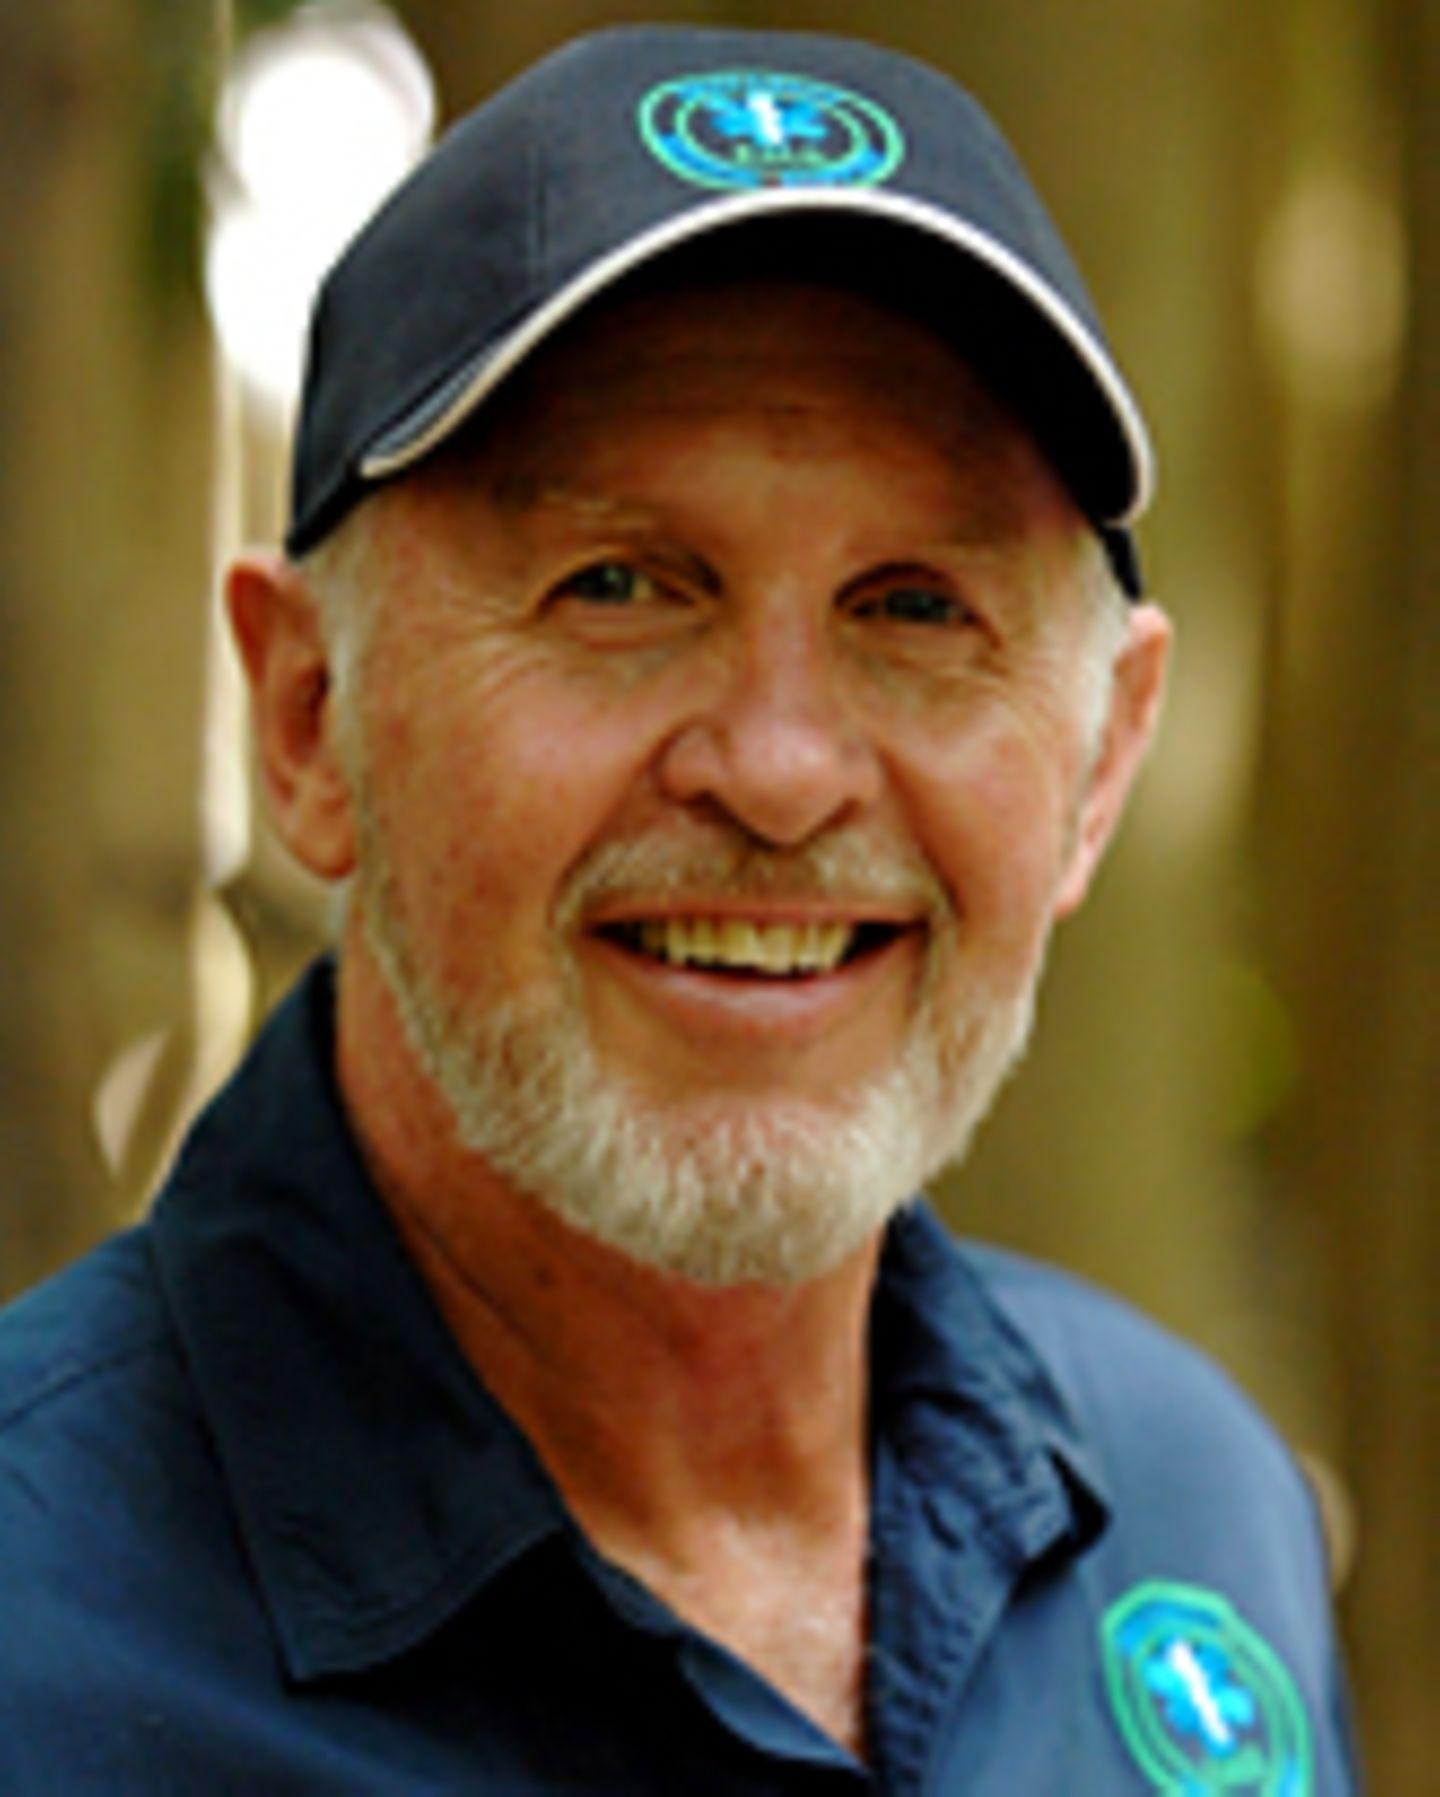 Dschungelcamp - Dr. Bob